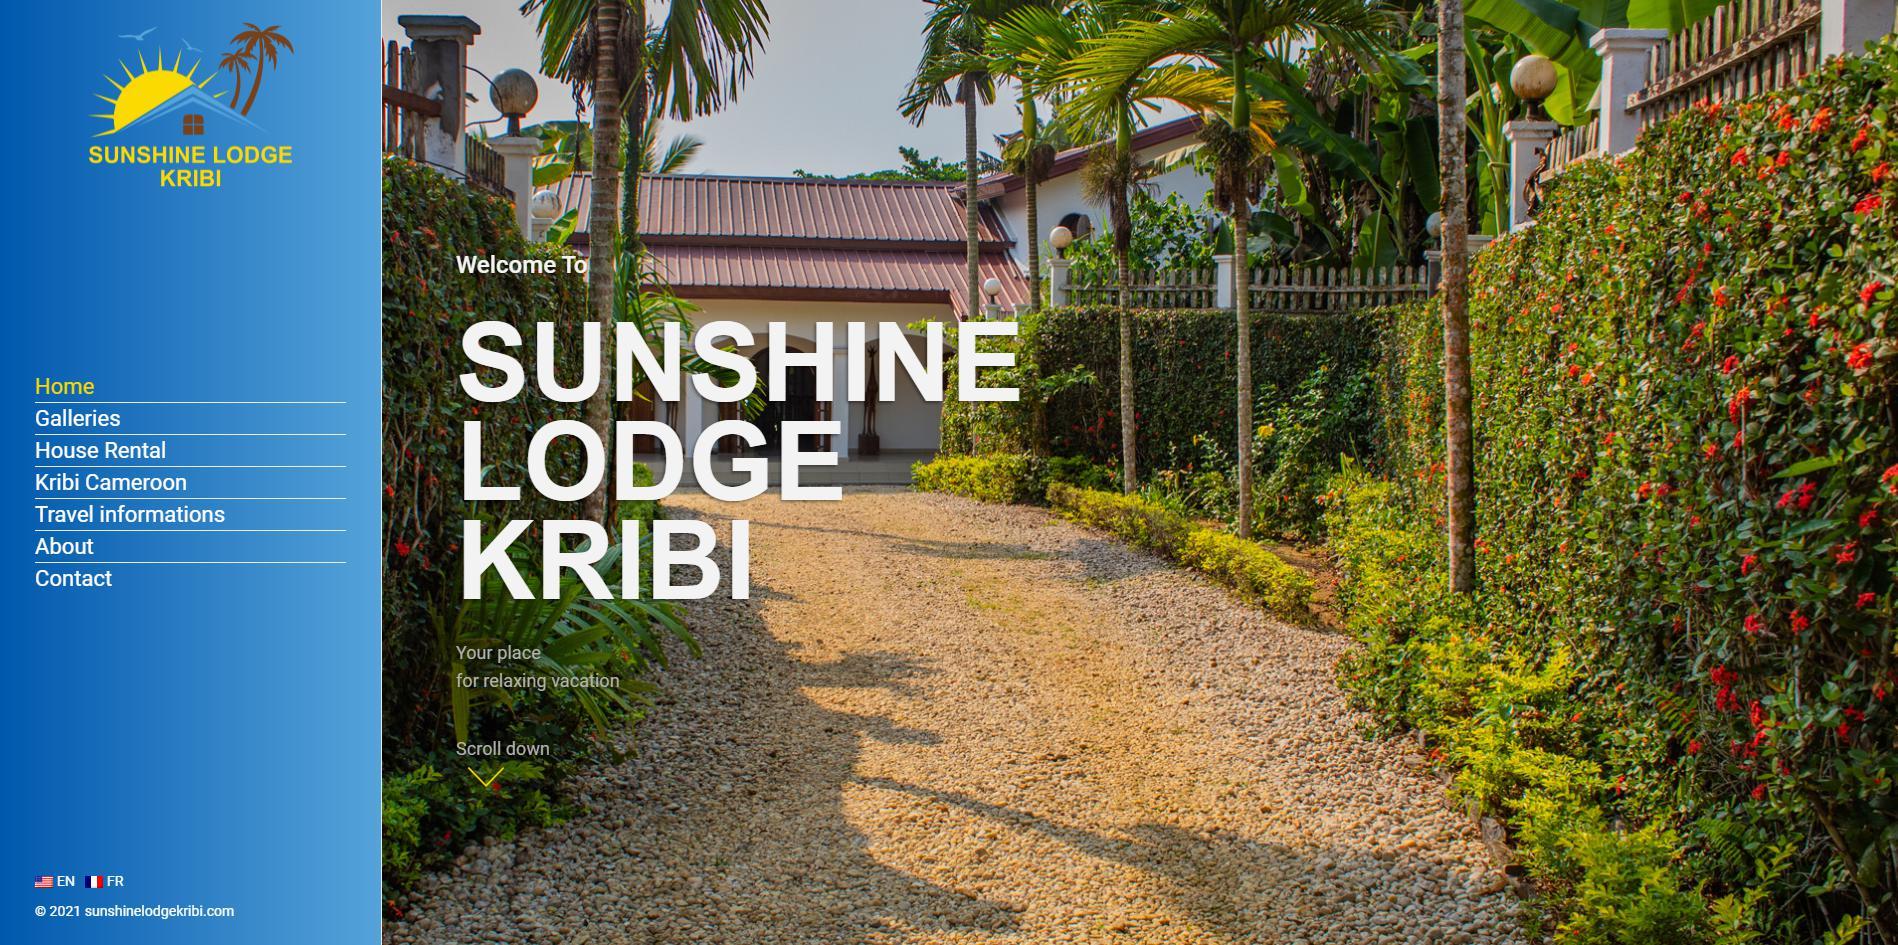 Sunshine Lodge Kribi